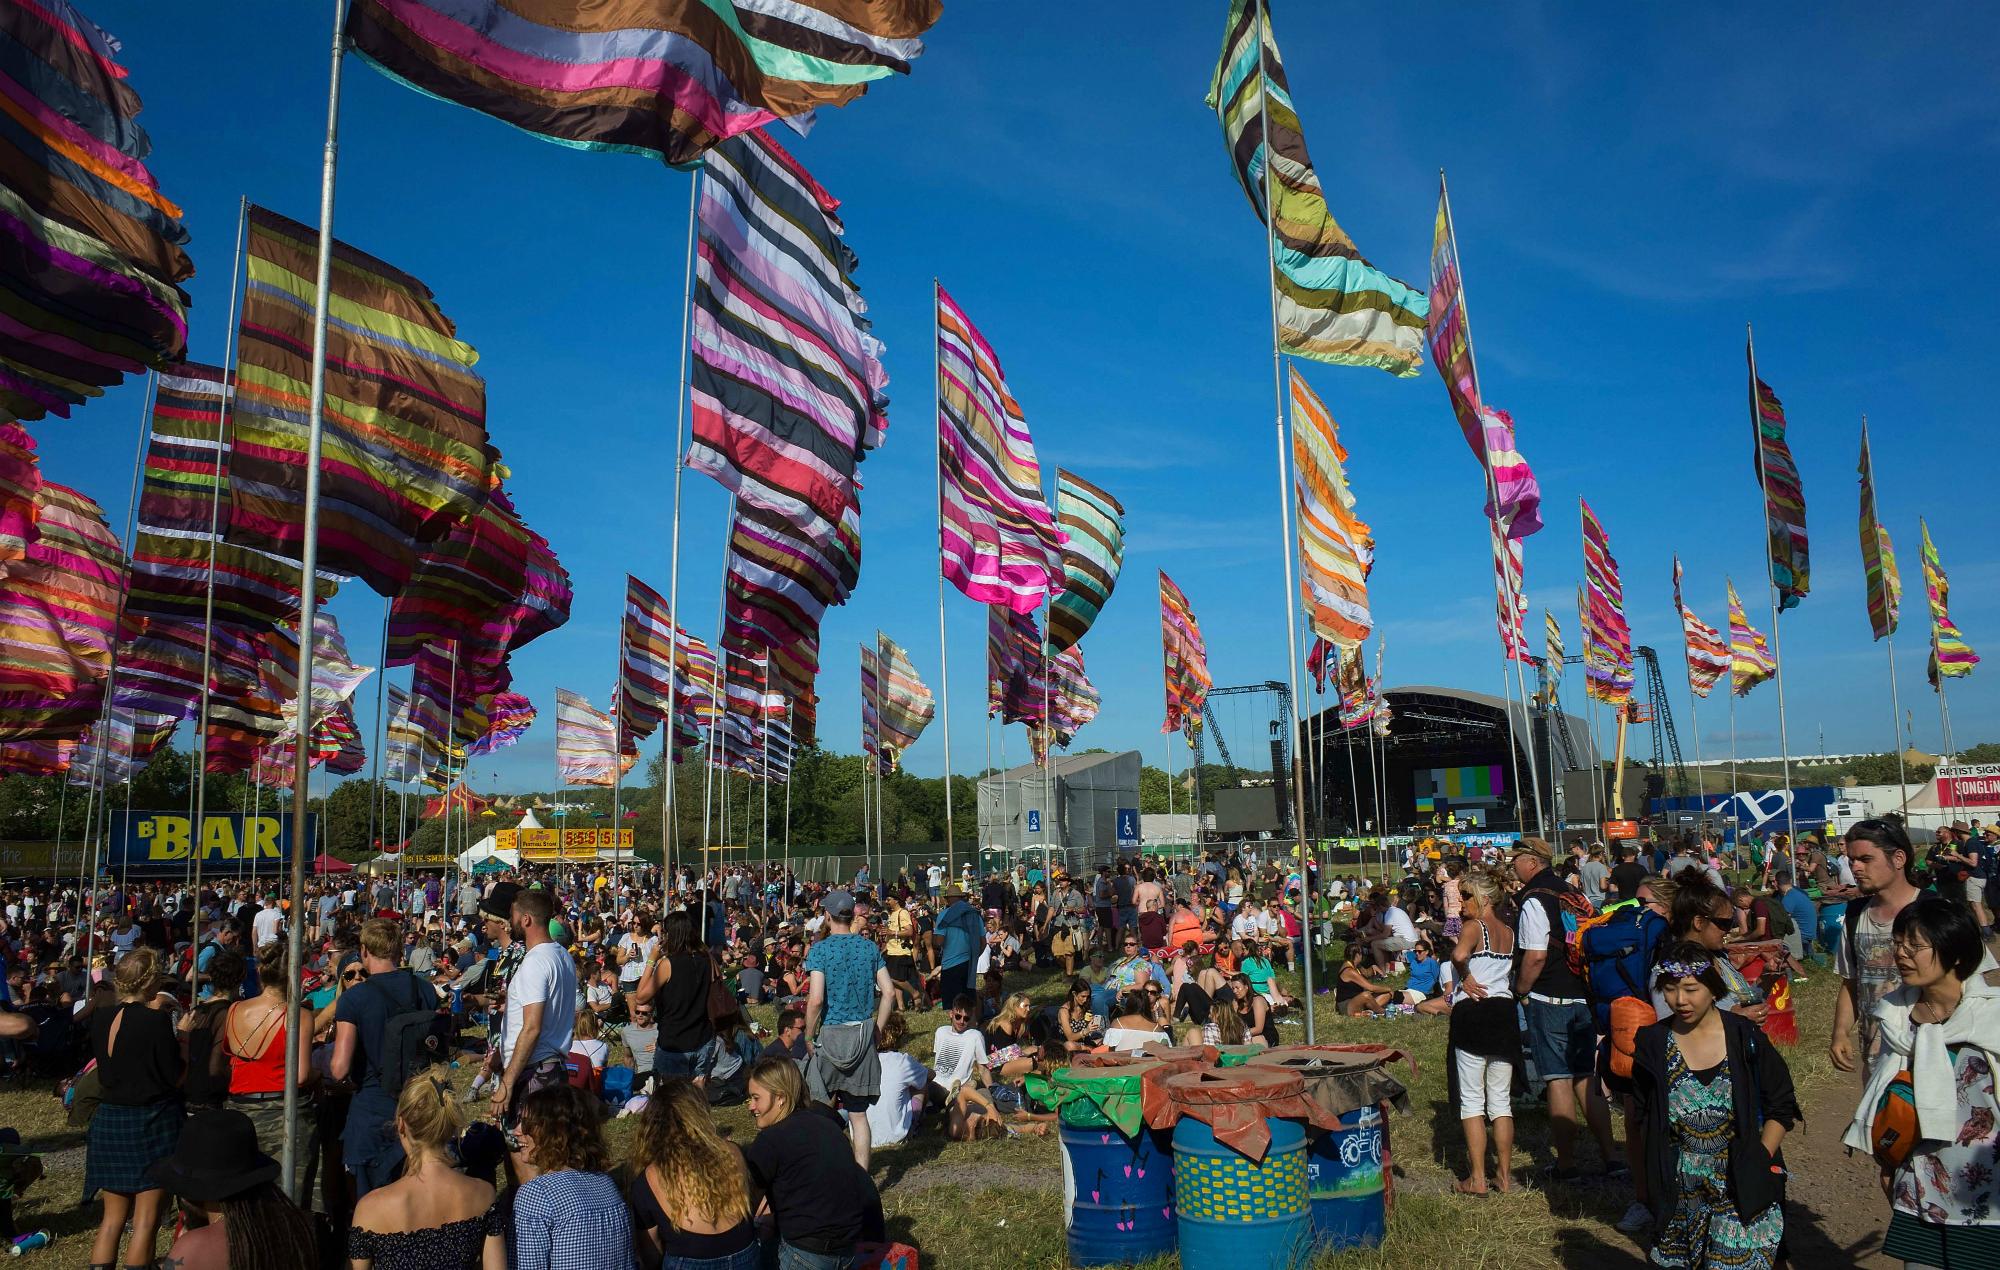 West Holts Stage Glastonbury playlist